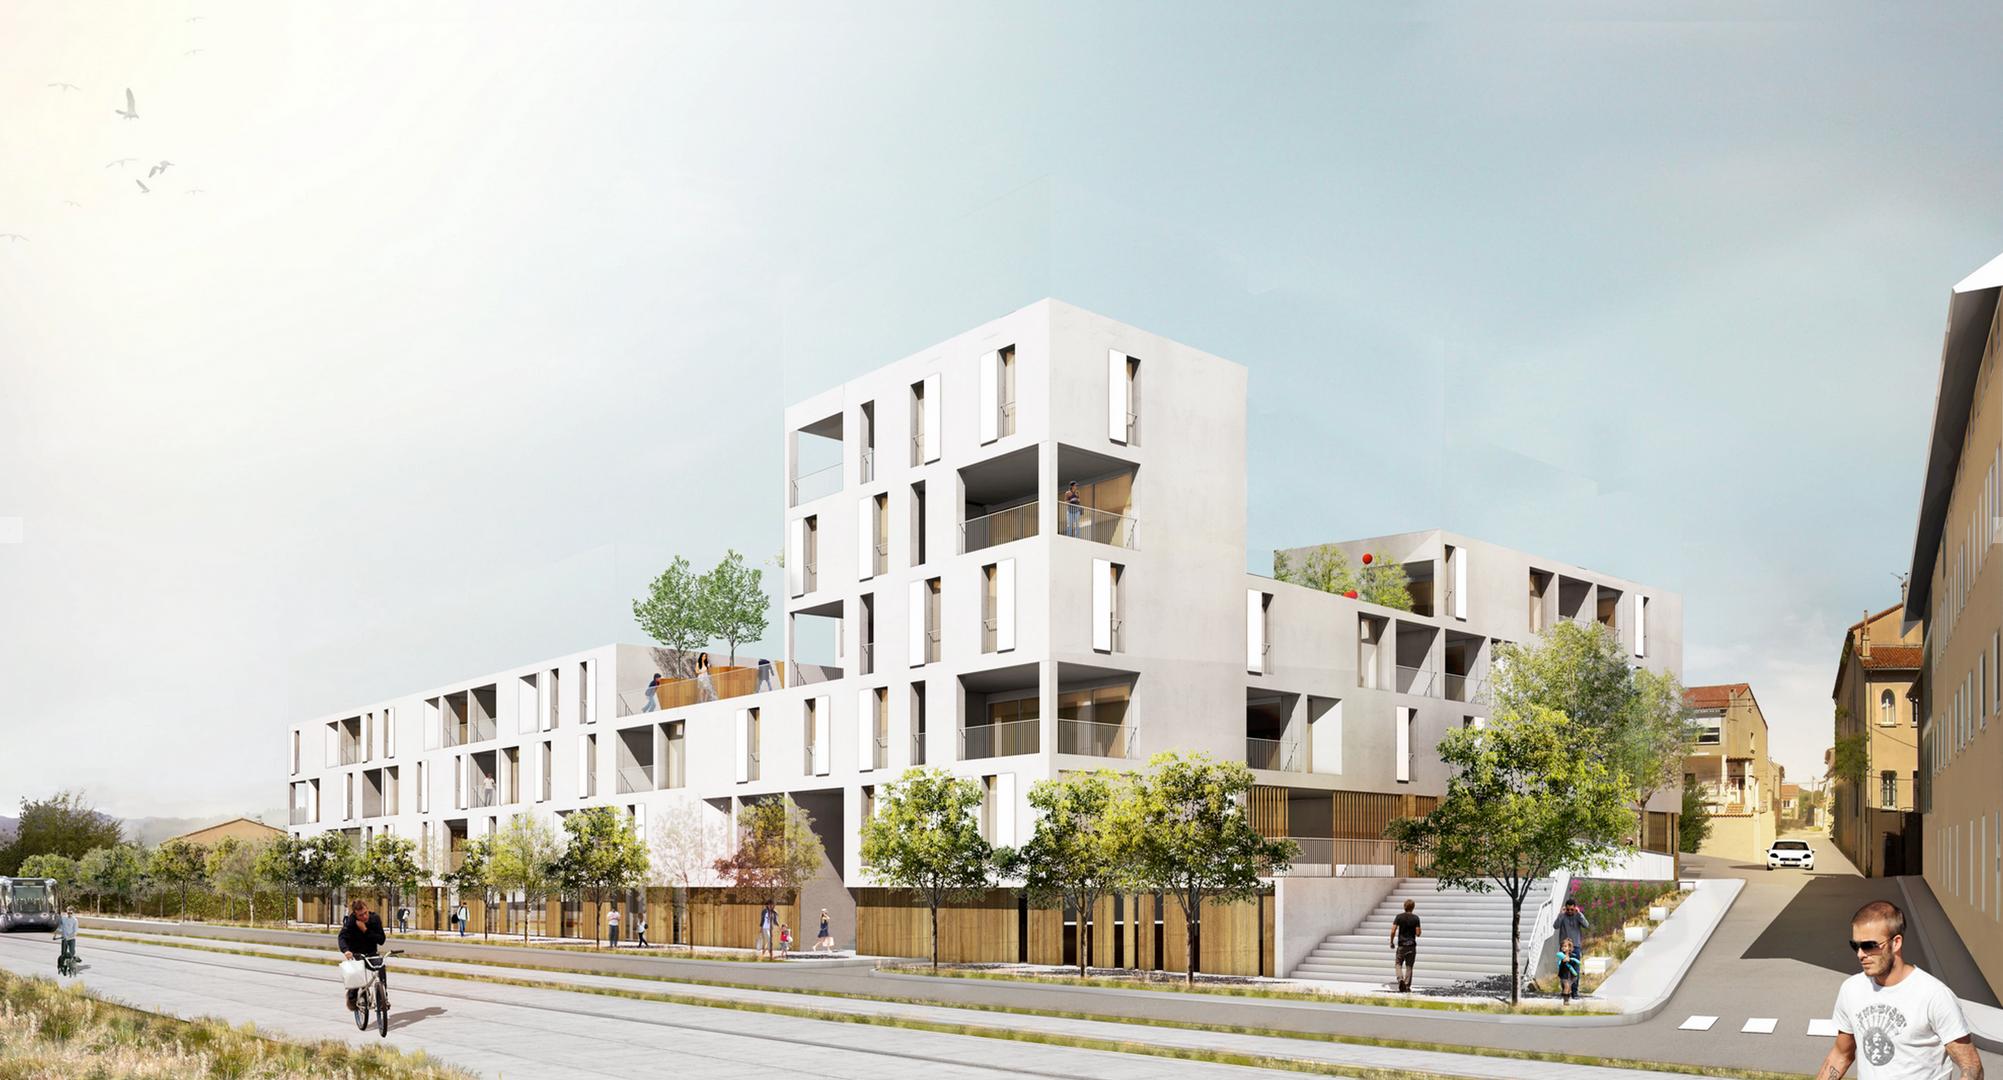 Frutoso-architecte-51 logements.png